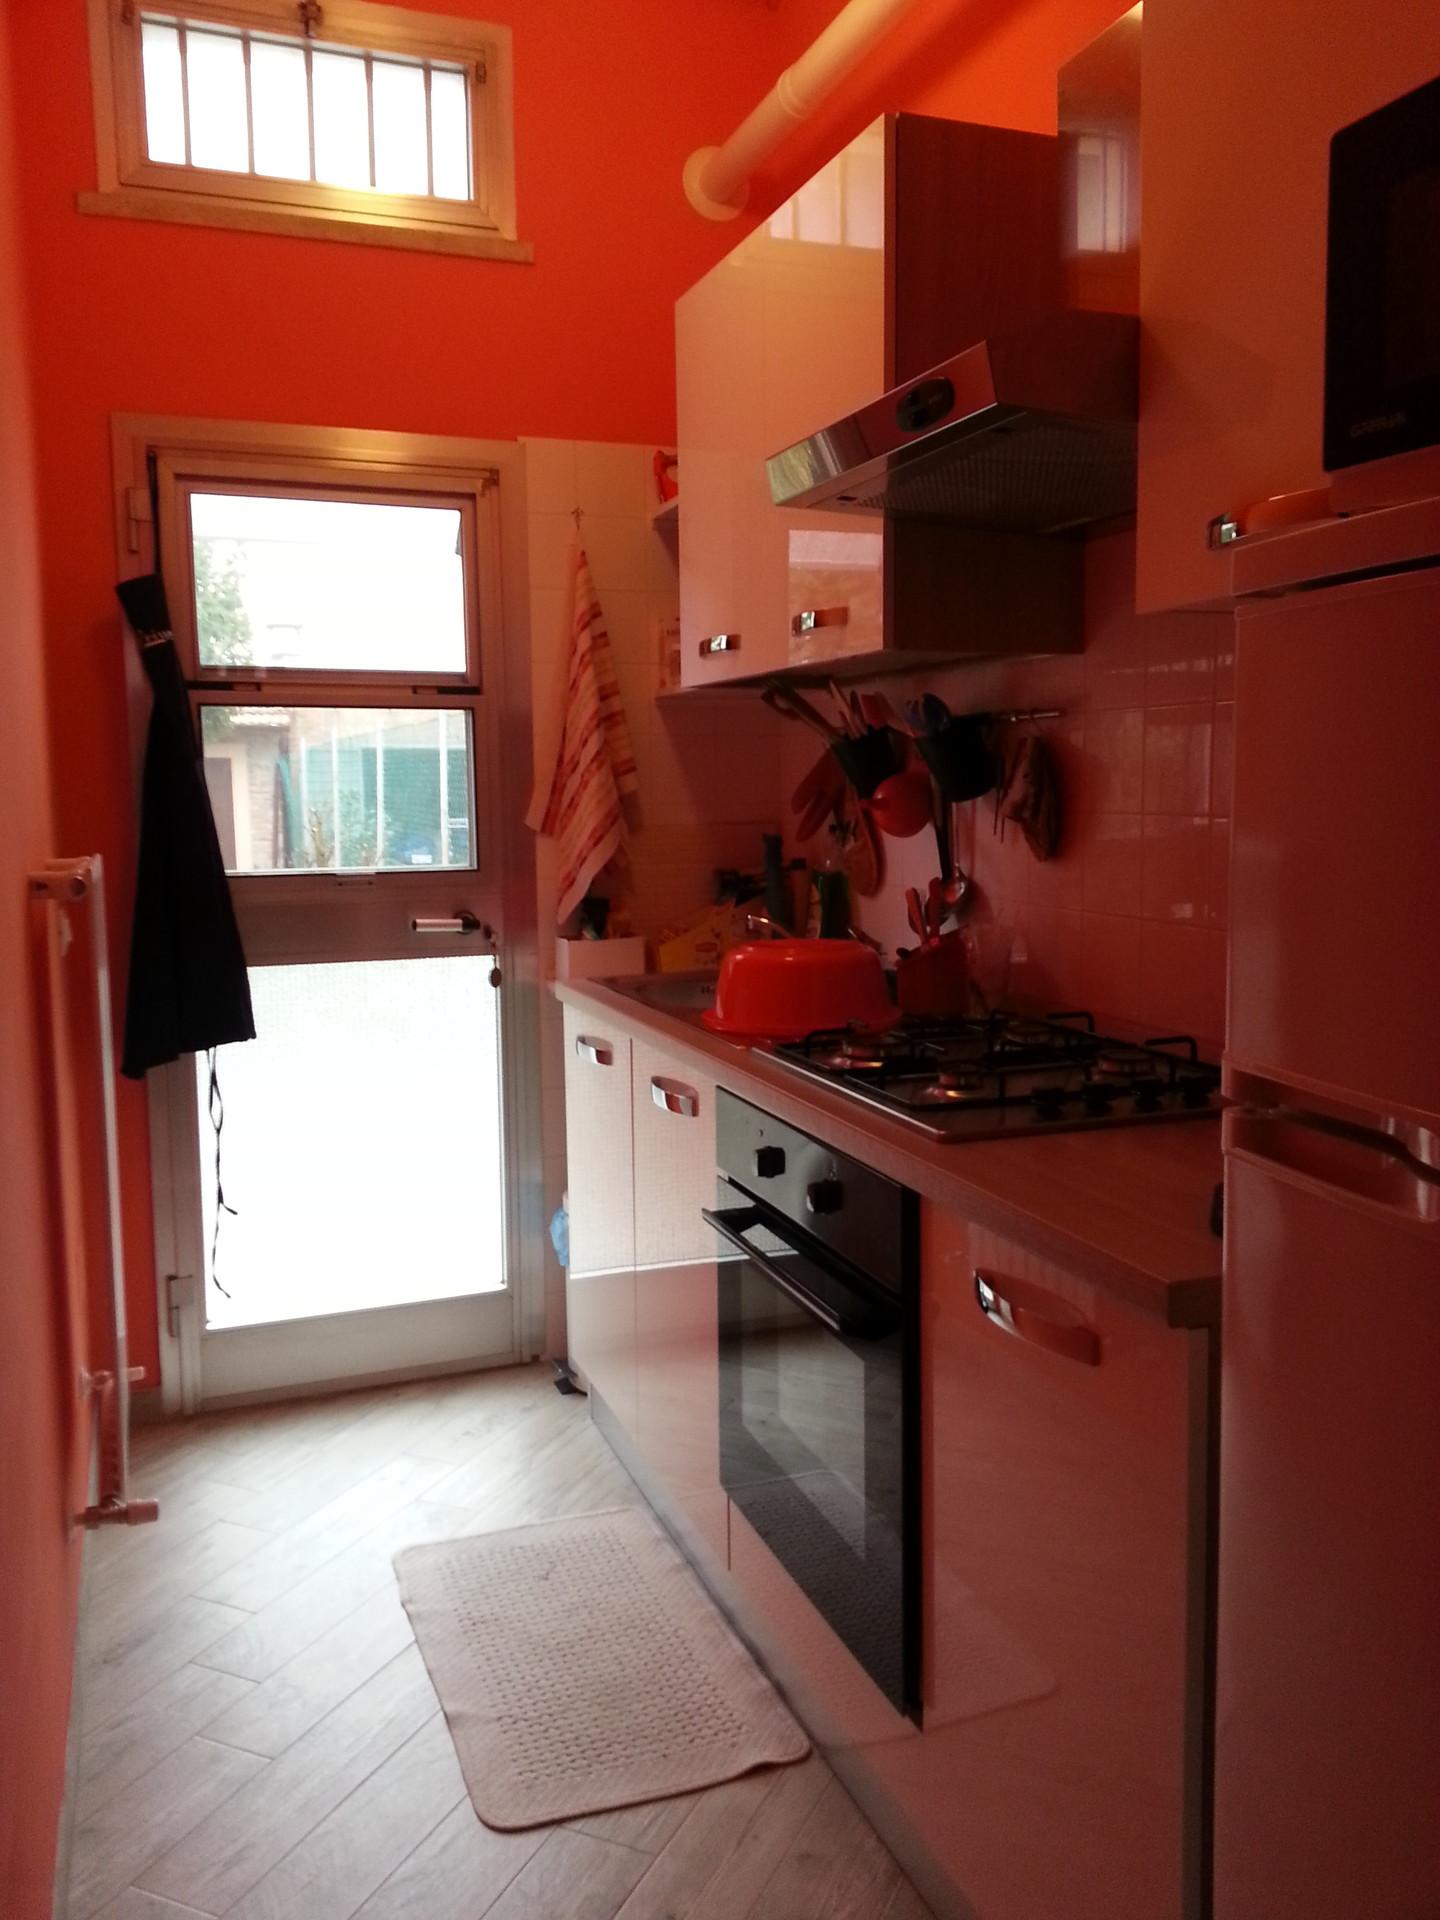 room-private-bathroom-center-ferrara-272d78ad14671996c0f52fd70c235a9b